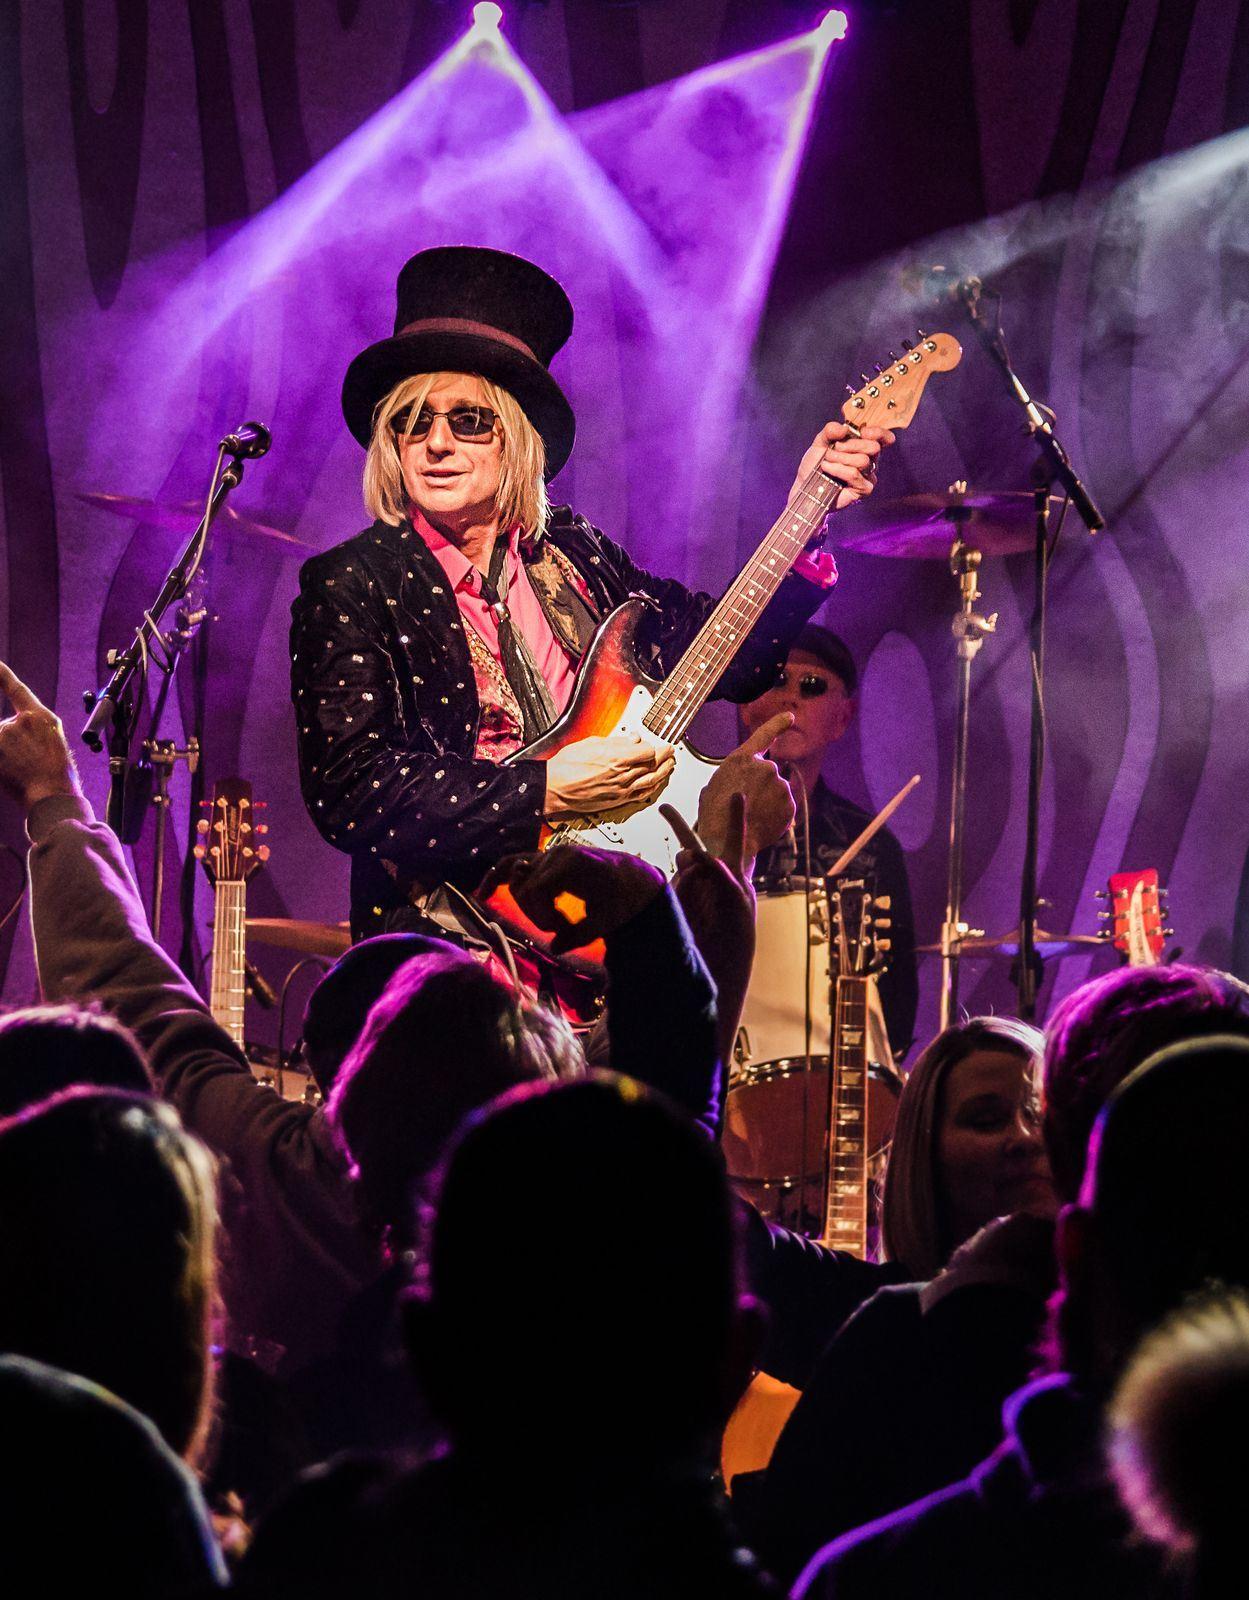 Petty Fever: Tom Petty Tribute